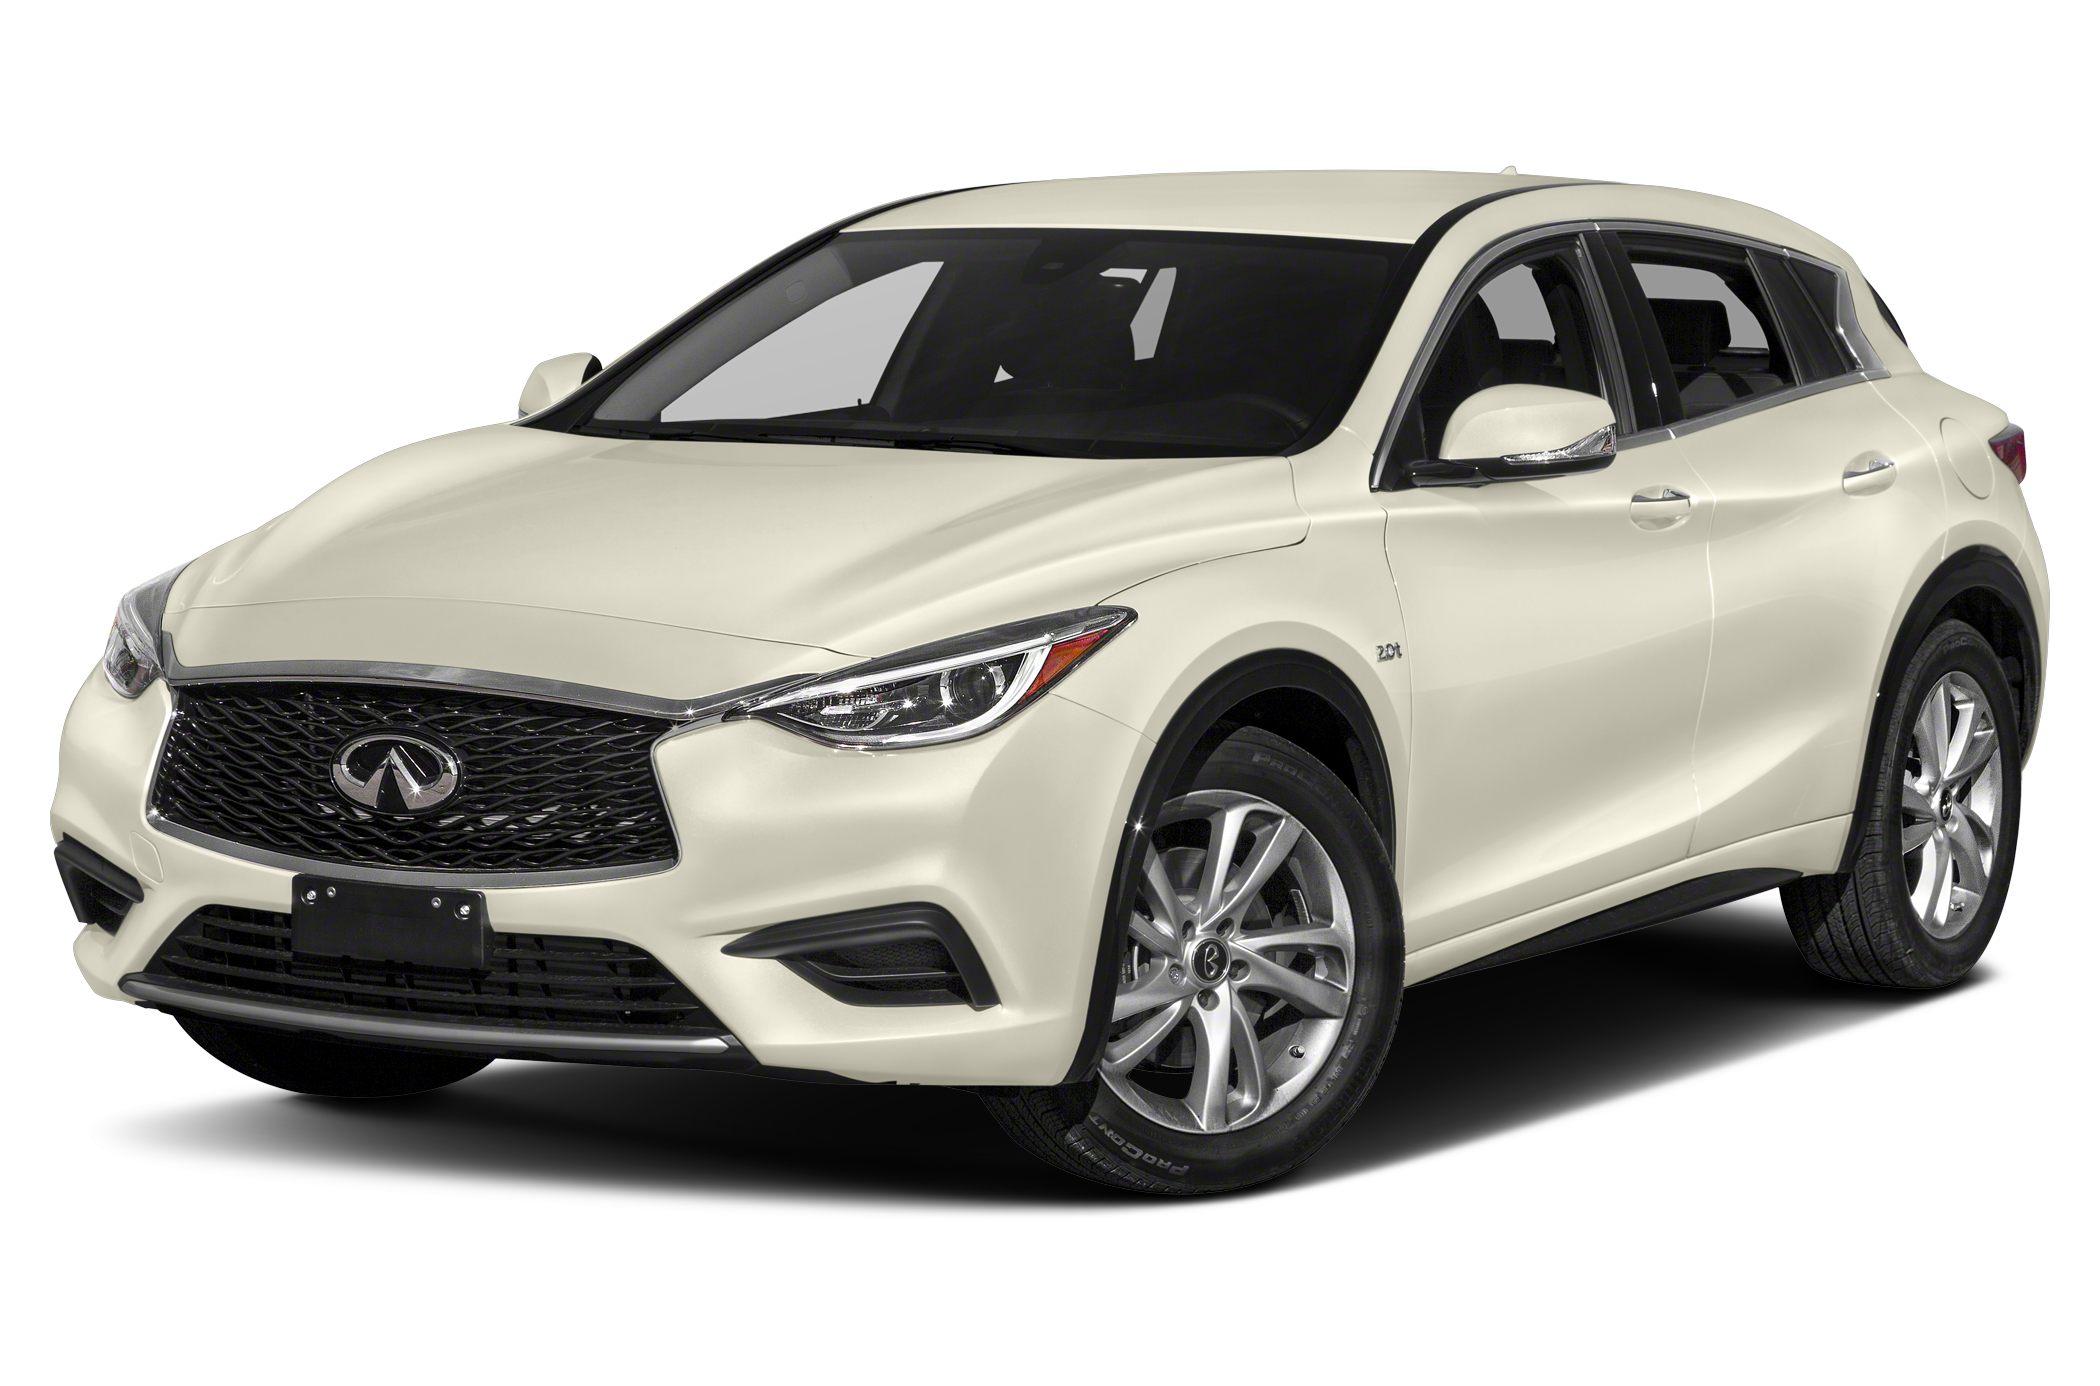 2018 INFINITI QX30 vs 2018 Lexus NX 300 and 2018 Mercedes Benz GLA